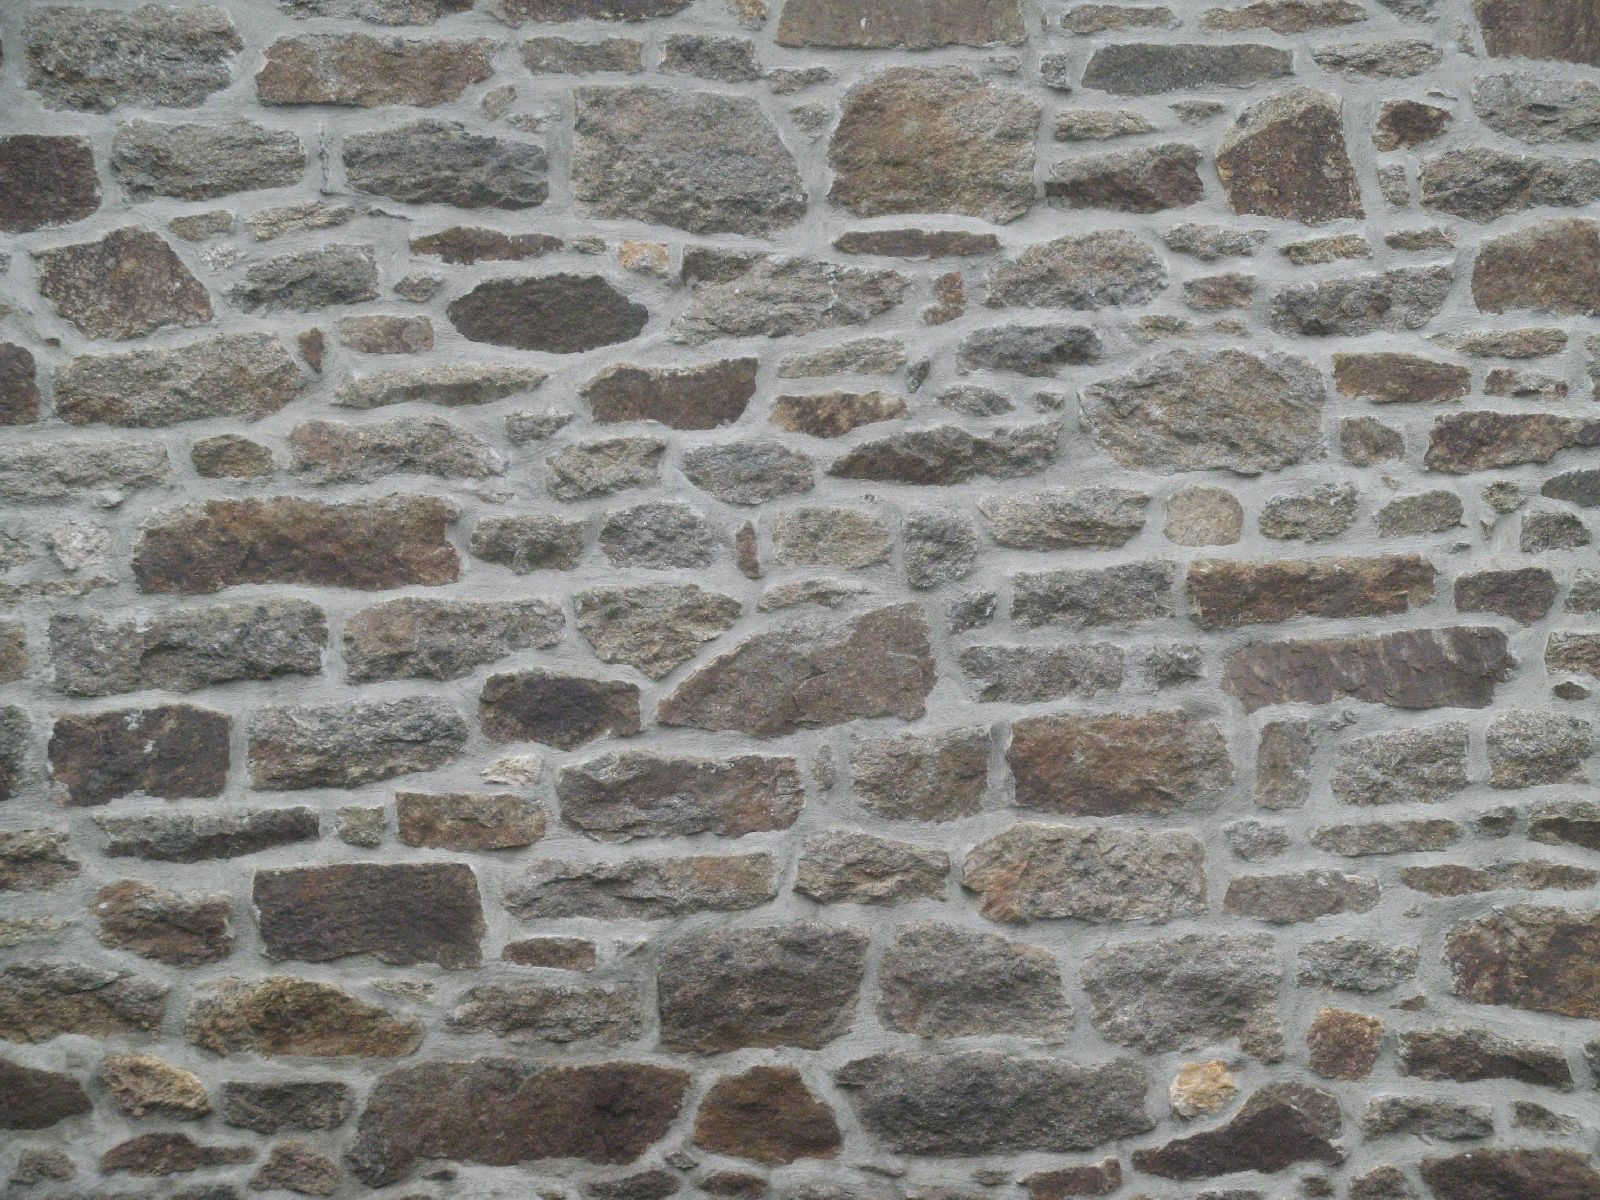 Brick_Texture_B_2475